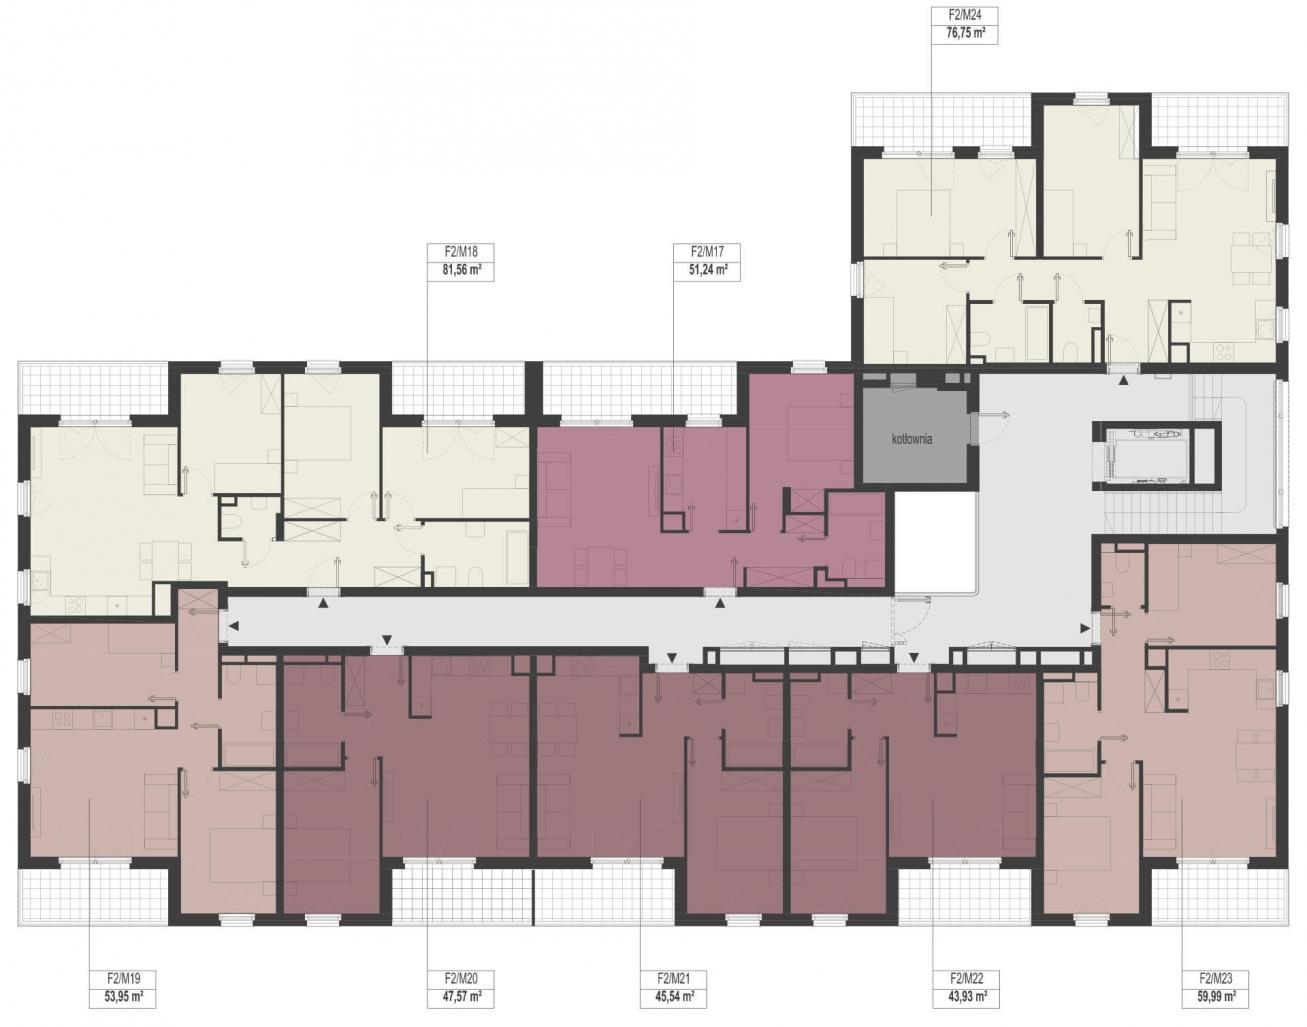 Etap 2 - Budynek F - Piętro 2